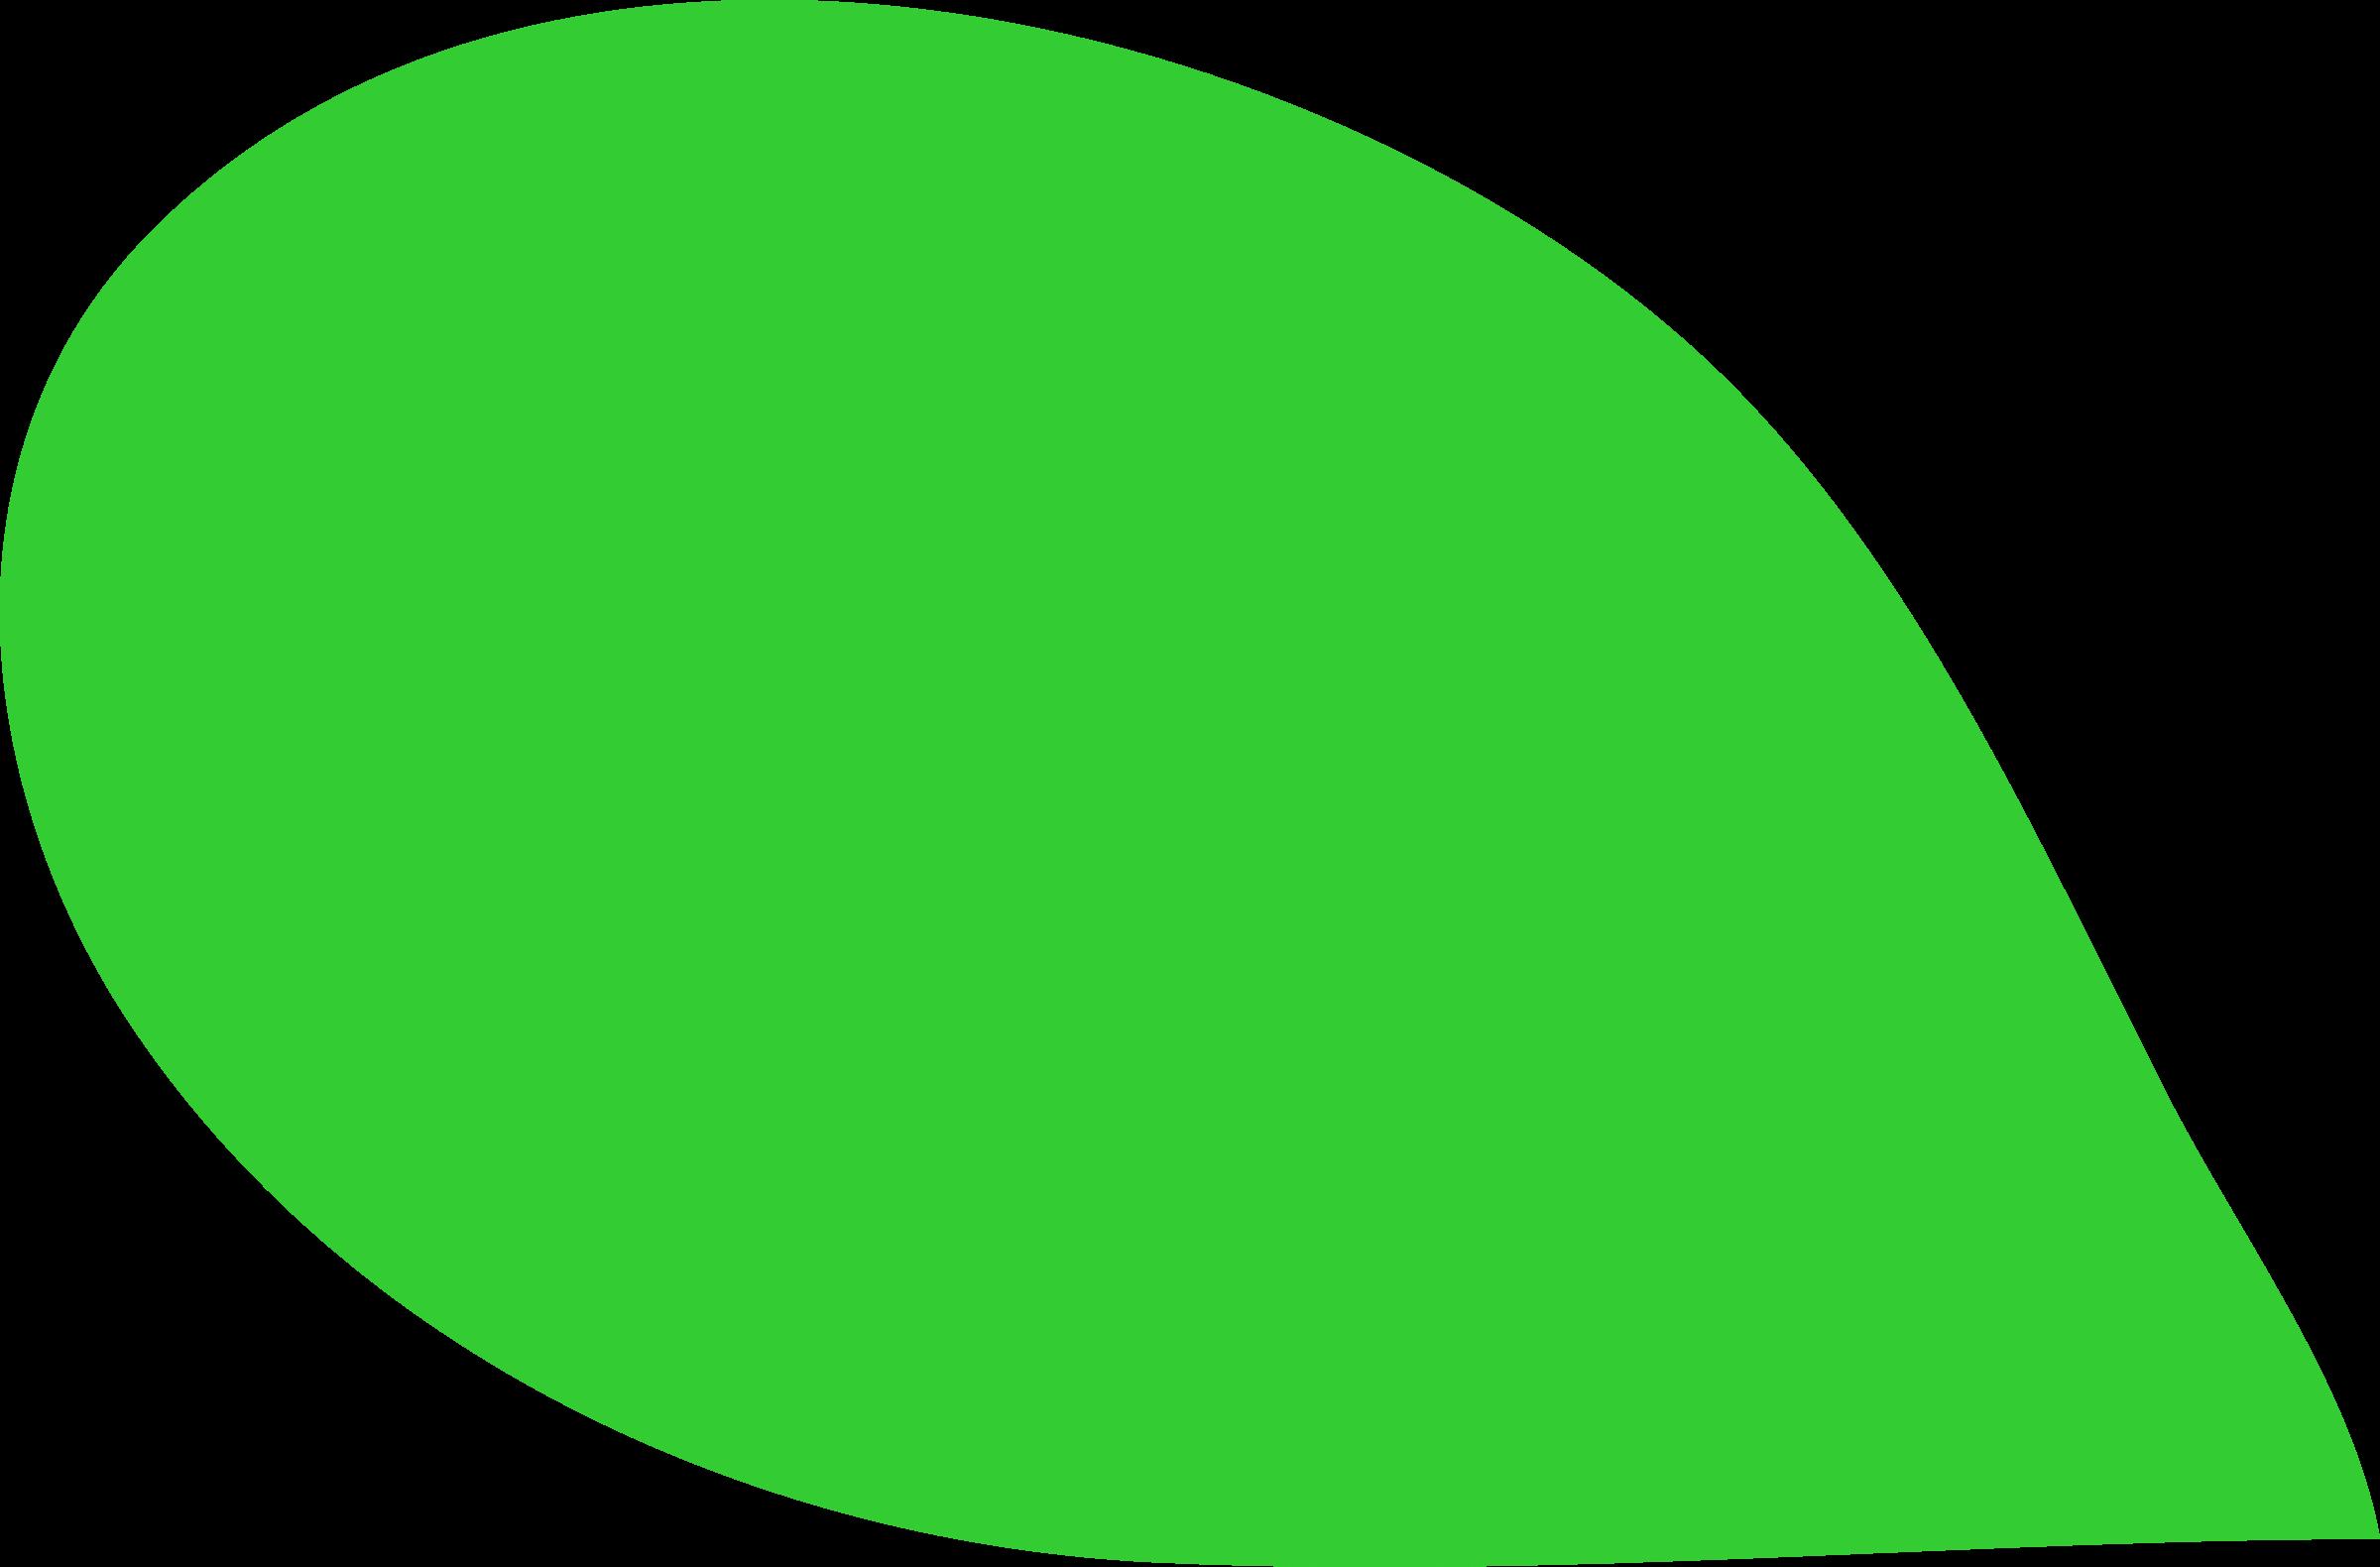 Flower shapes clipart vector transparent stock Leaf Shapes Clipart & Leaf Shapes Clip Art Images #2105 - OnClipart vector transparent stock